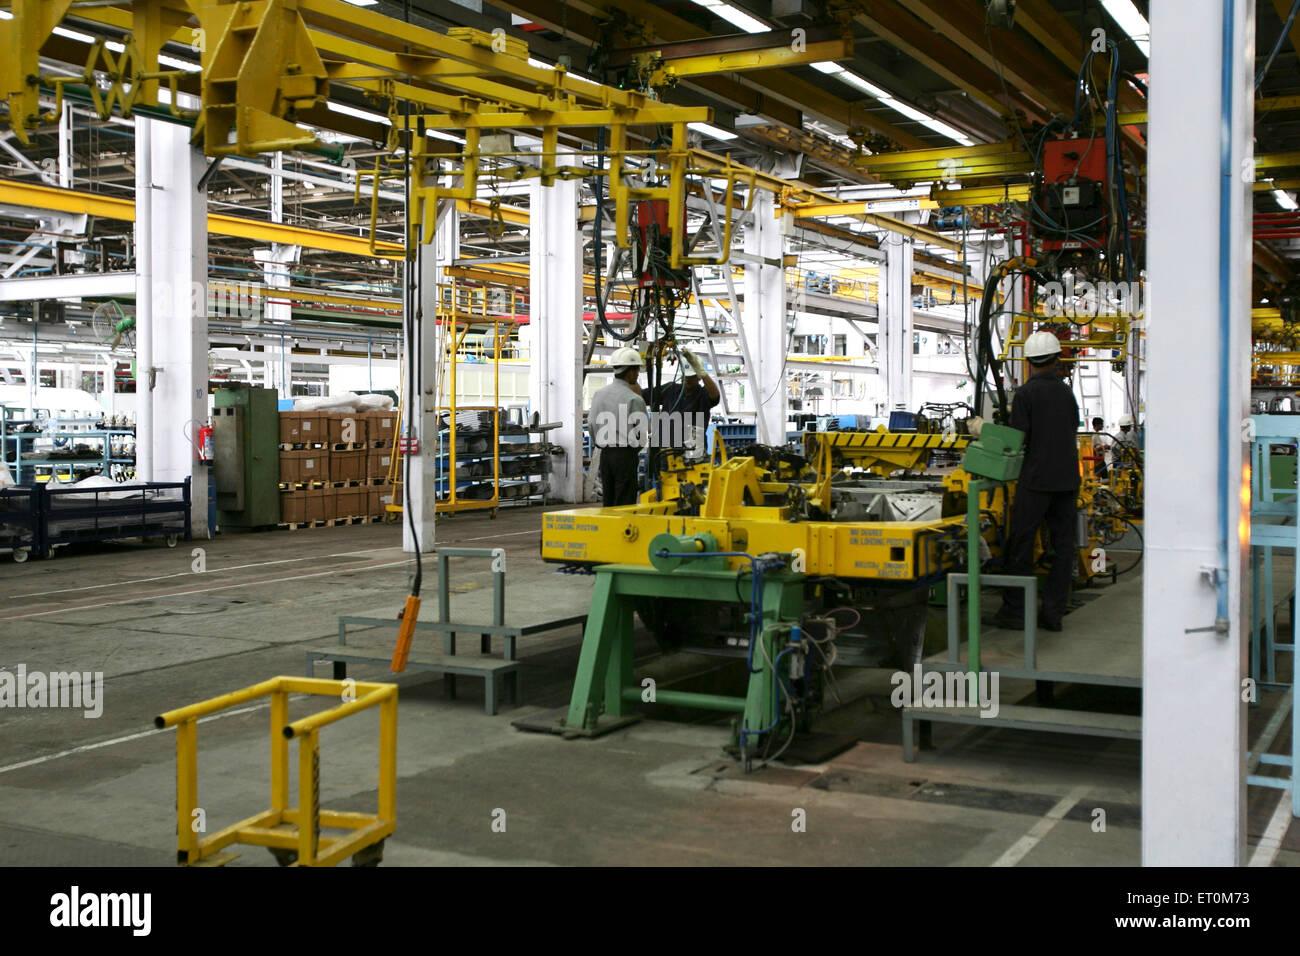 Los expertos que trabajan en el taller de automóviles ; Tata Motors planta cerca de Pune Pimpri ; ; ; Maharashtra Imagen De Stock